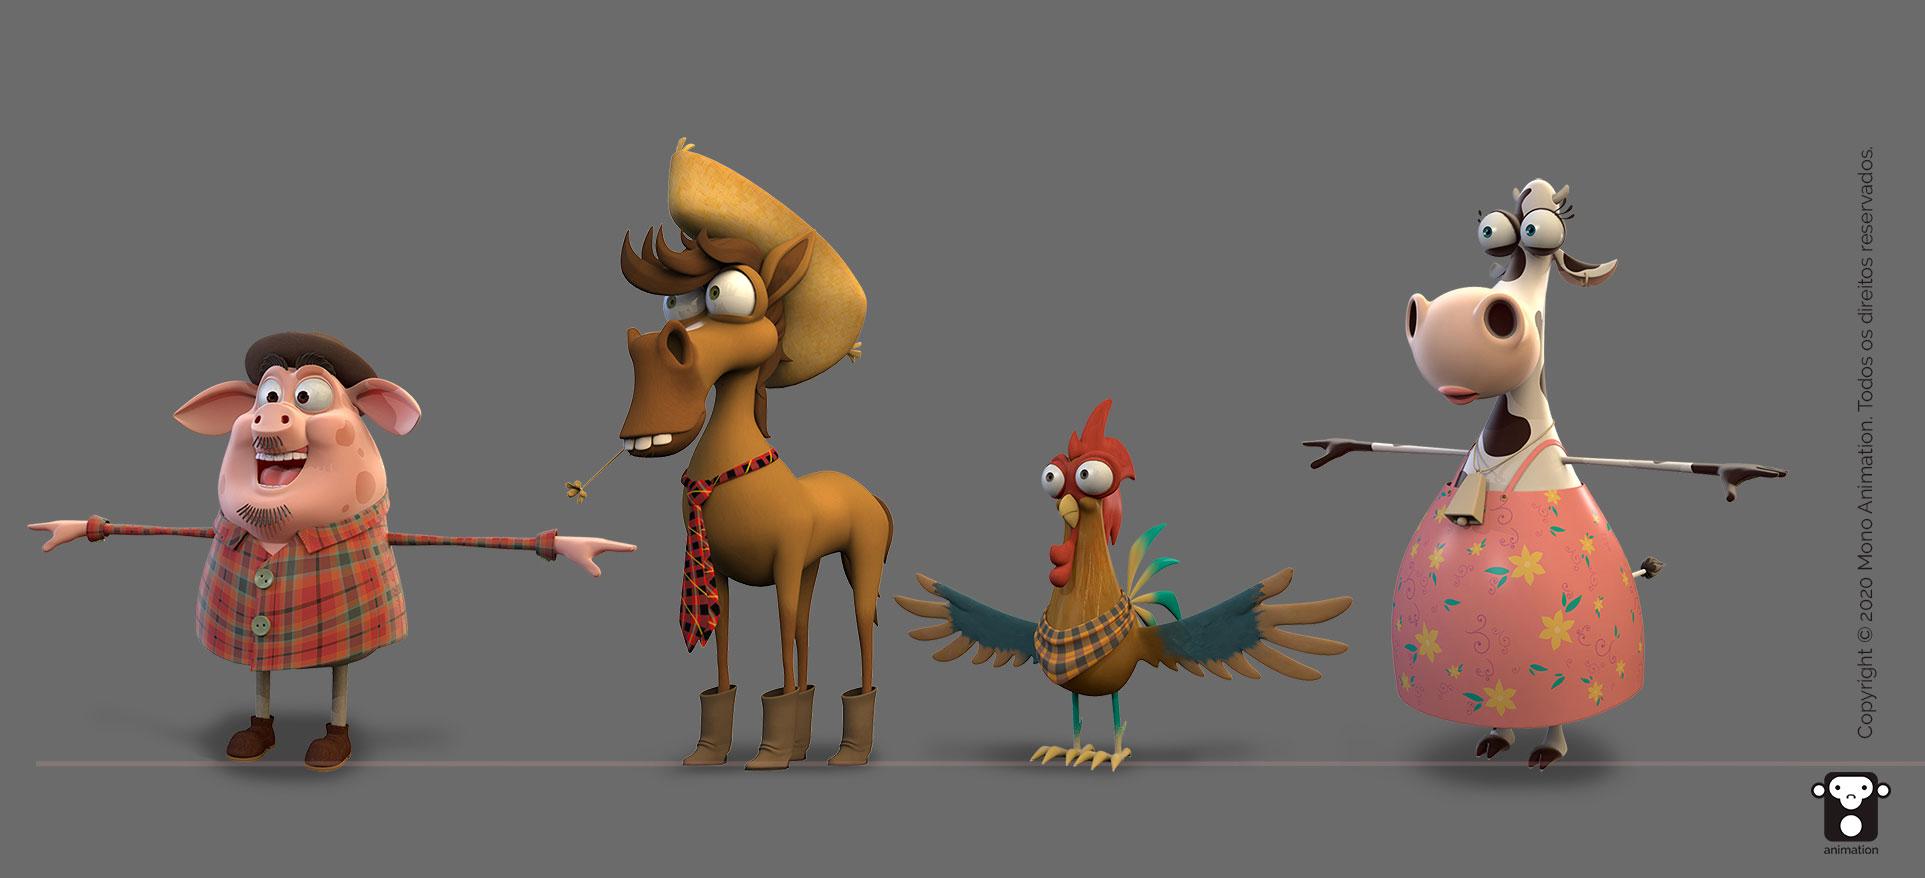 farmshare-ilustracao-06-copyright